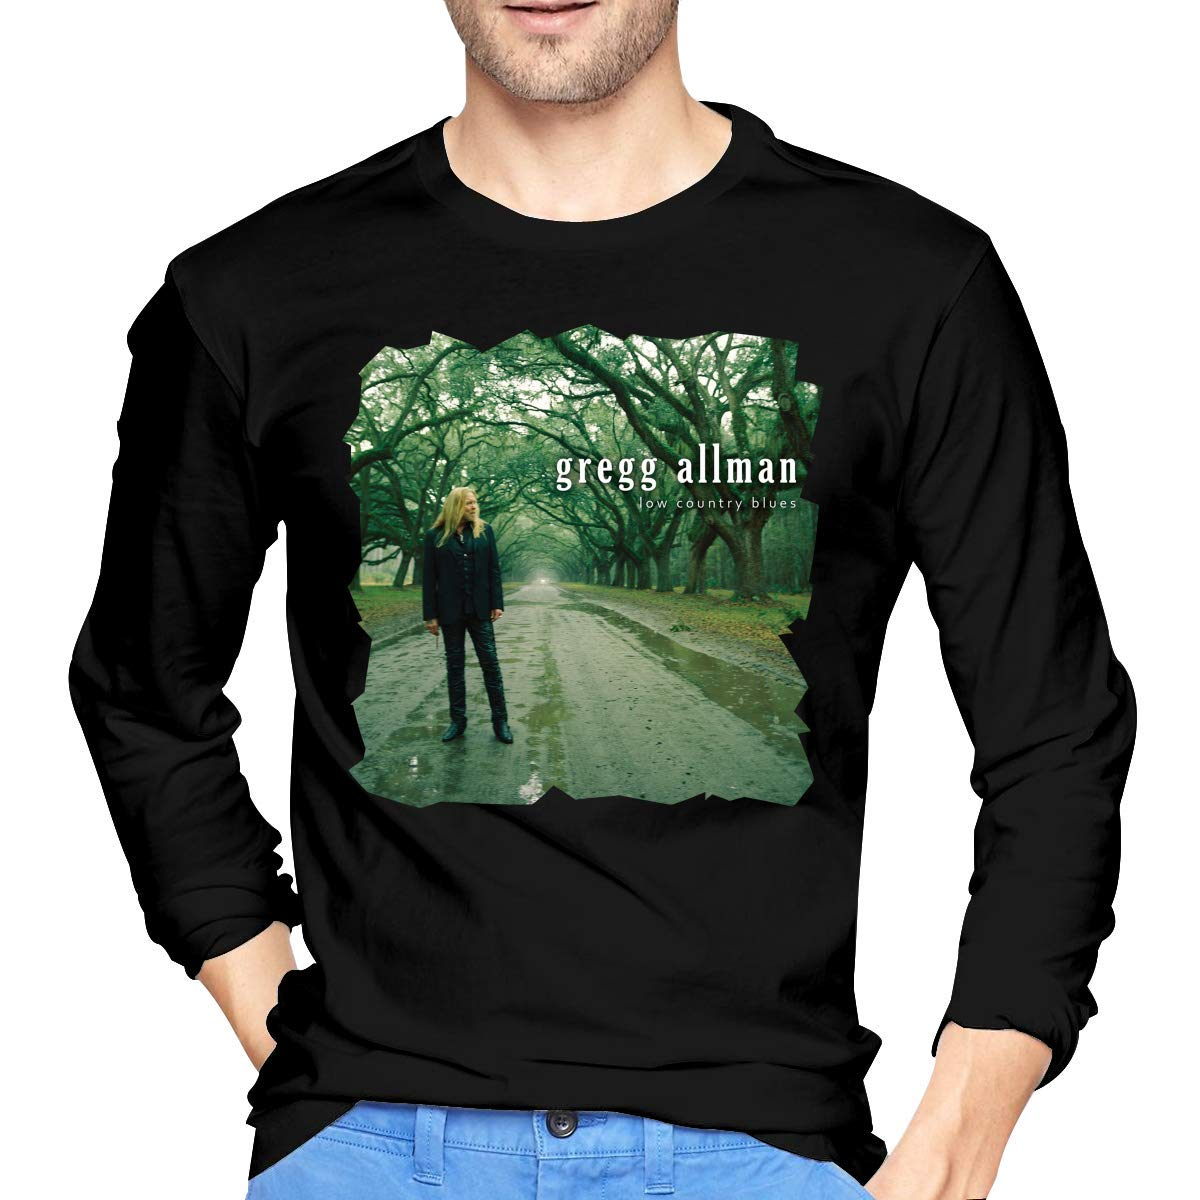 Fssatung S Gregg Allman Low Country Blues Tees Black Shirts